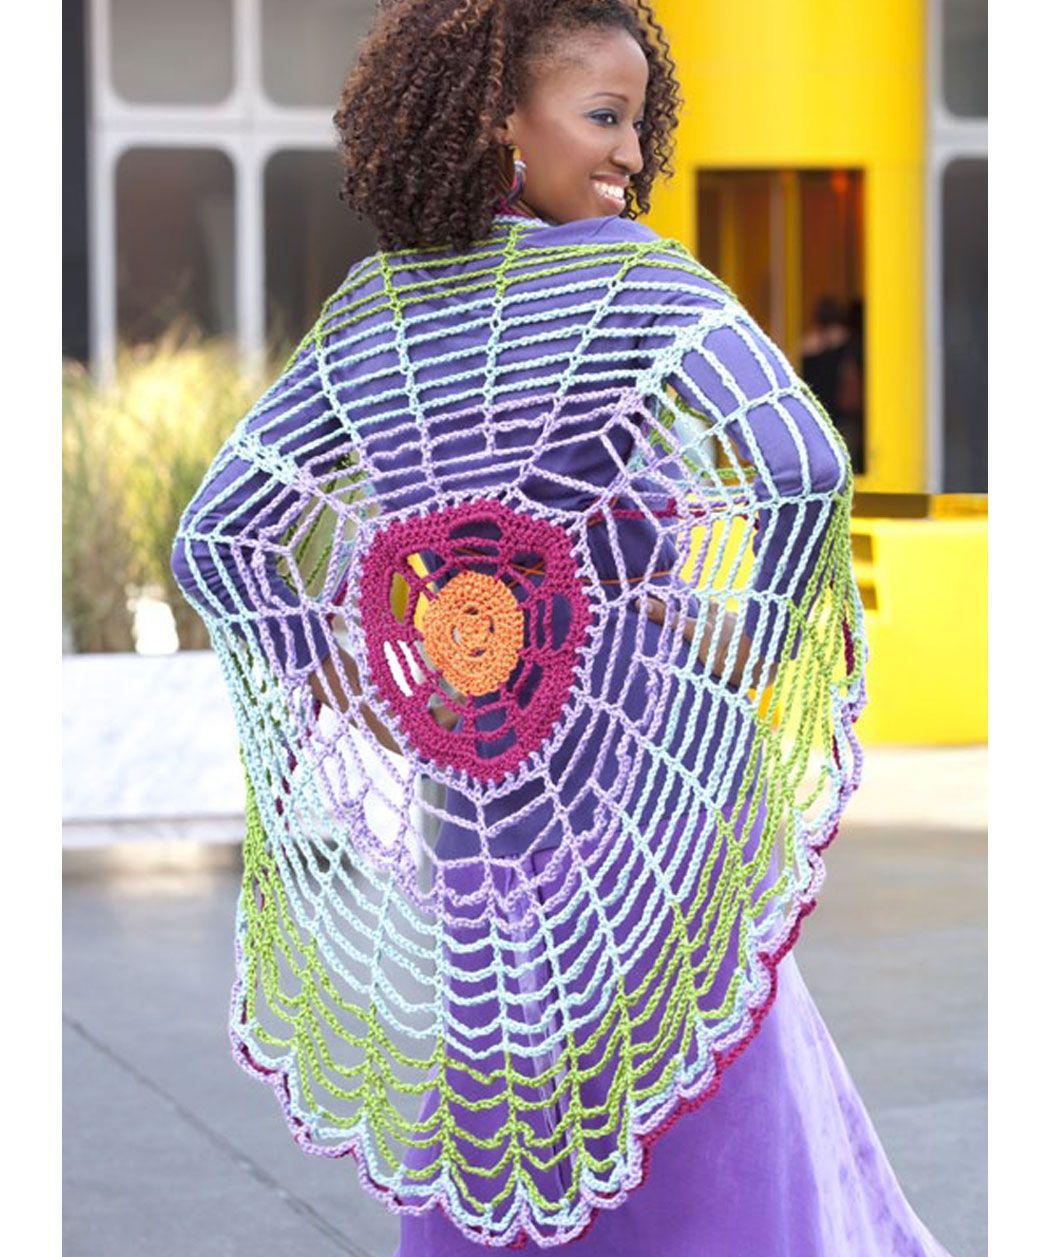 Versatile Circle Wrap | crafting | Pinterest | Jacken, Handarbeiten ...